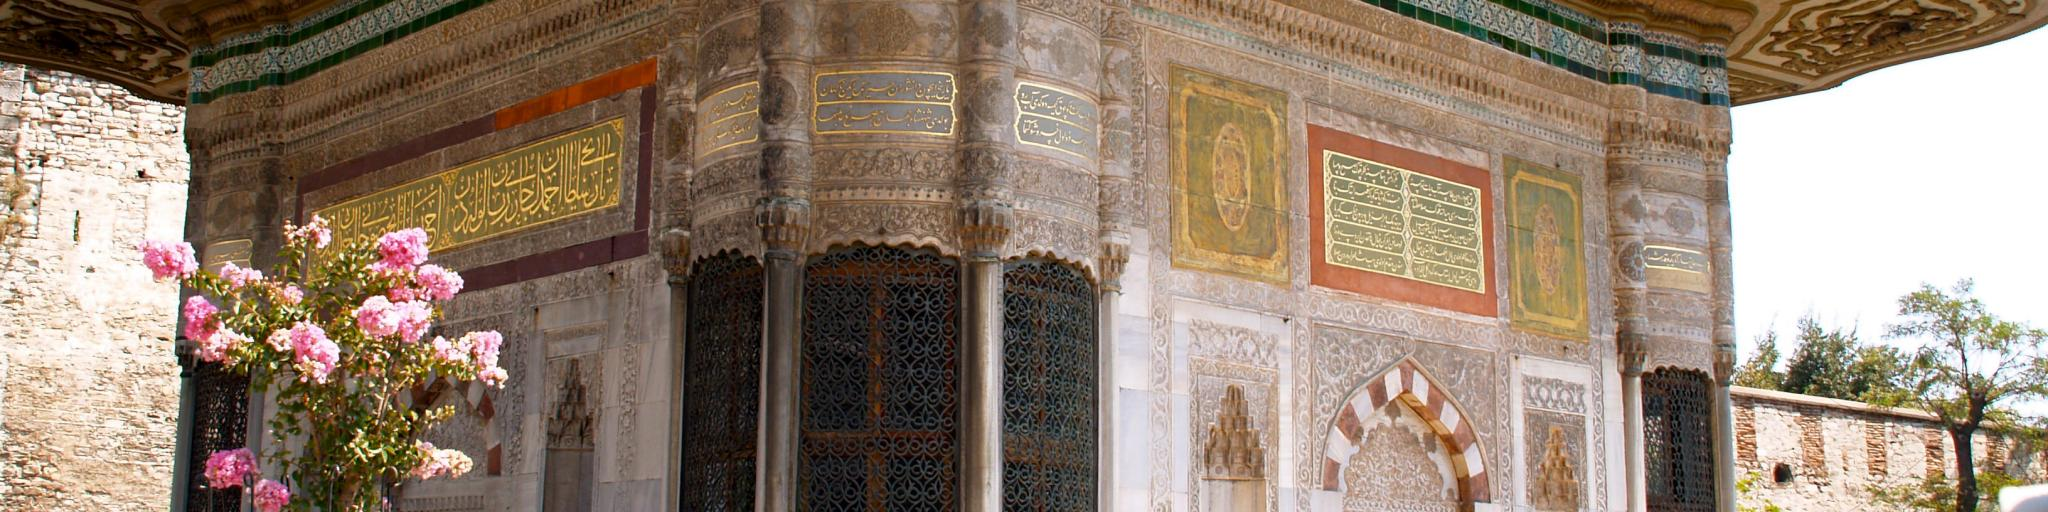 Visitors walk around the ornately decorated Topkapi Palace in Istanbul, Turkey